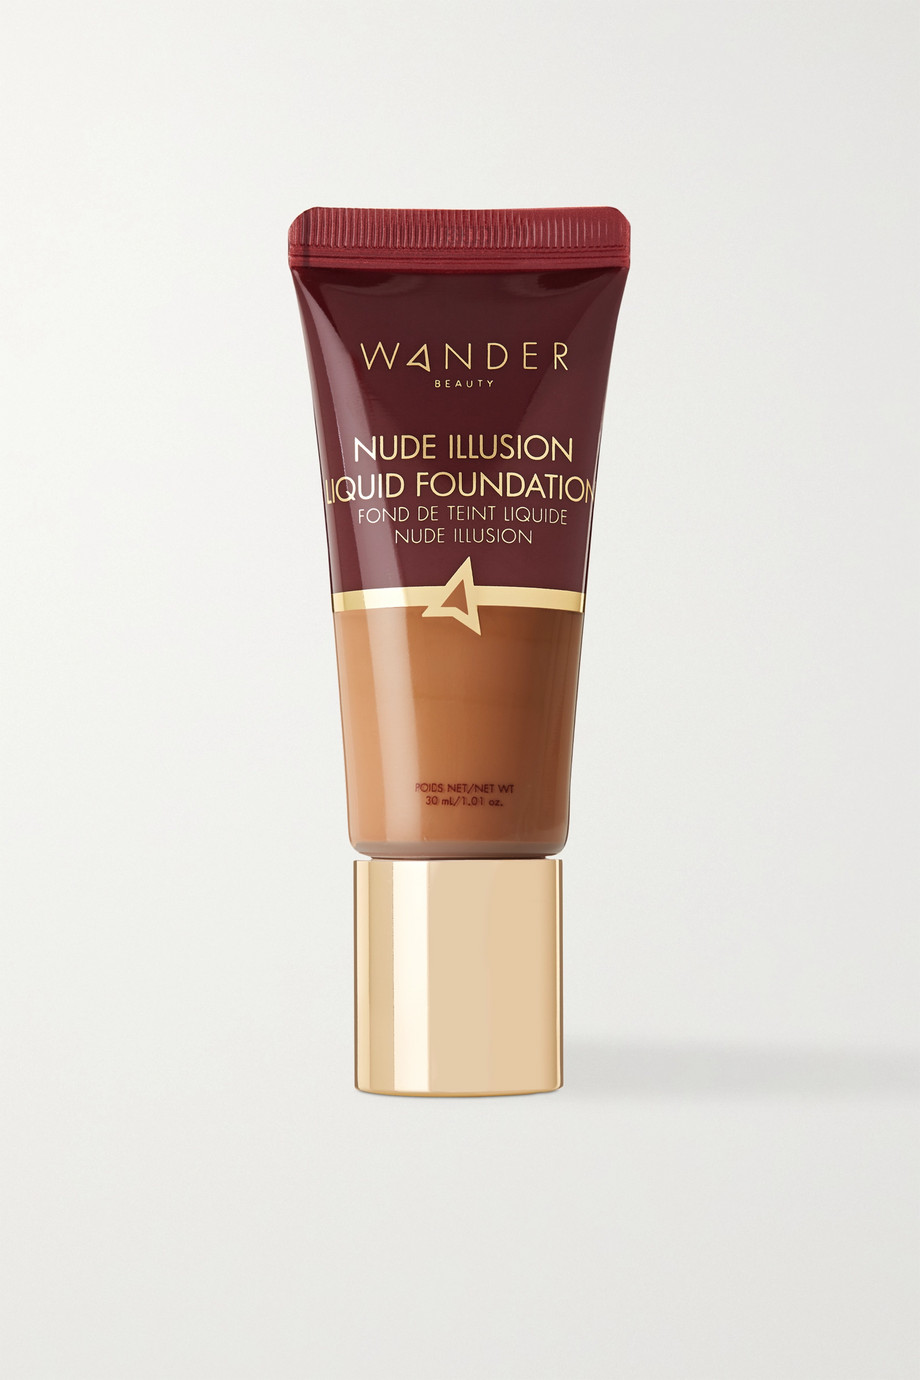 Wander Beauty Nude Illusion Liquid Foundation – Golden Medium – Foundation